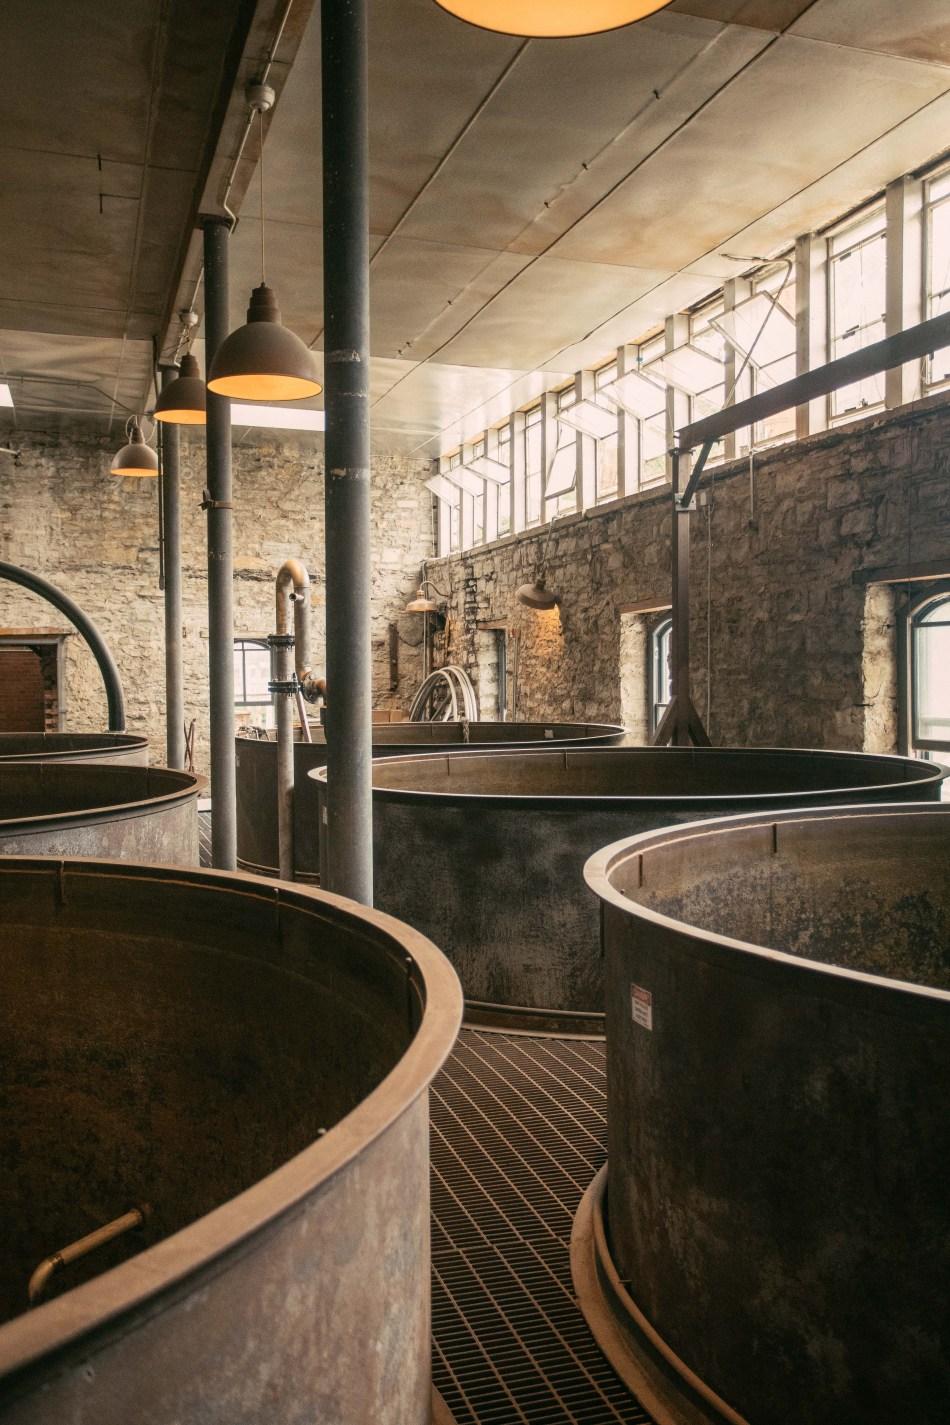 CastleAndKey Fermentation Tanks